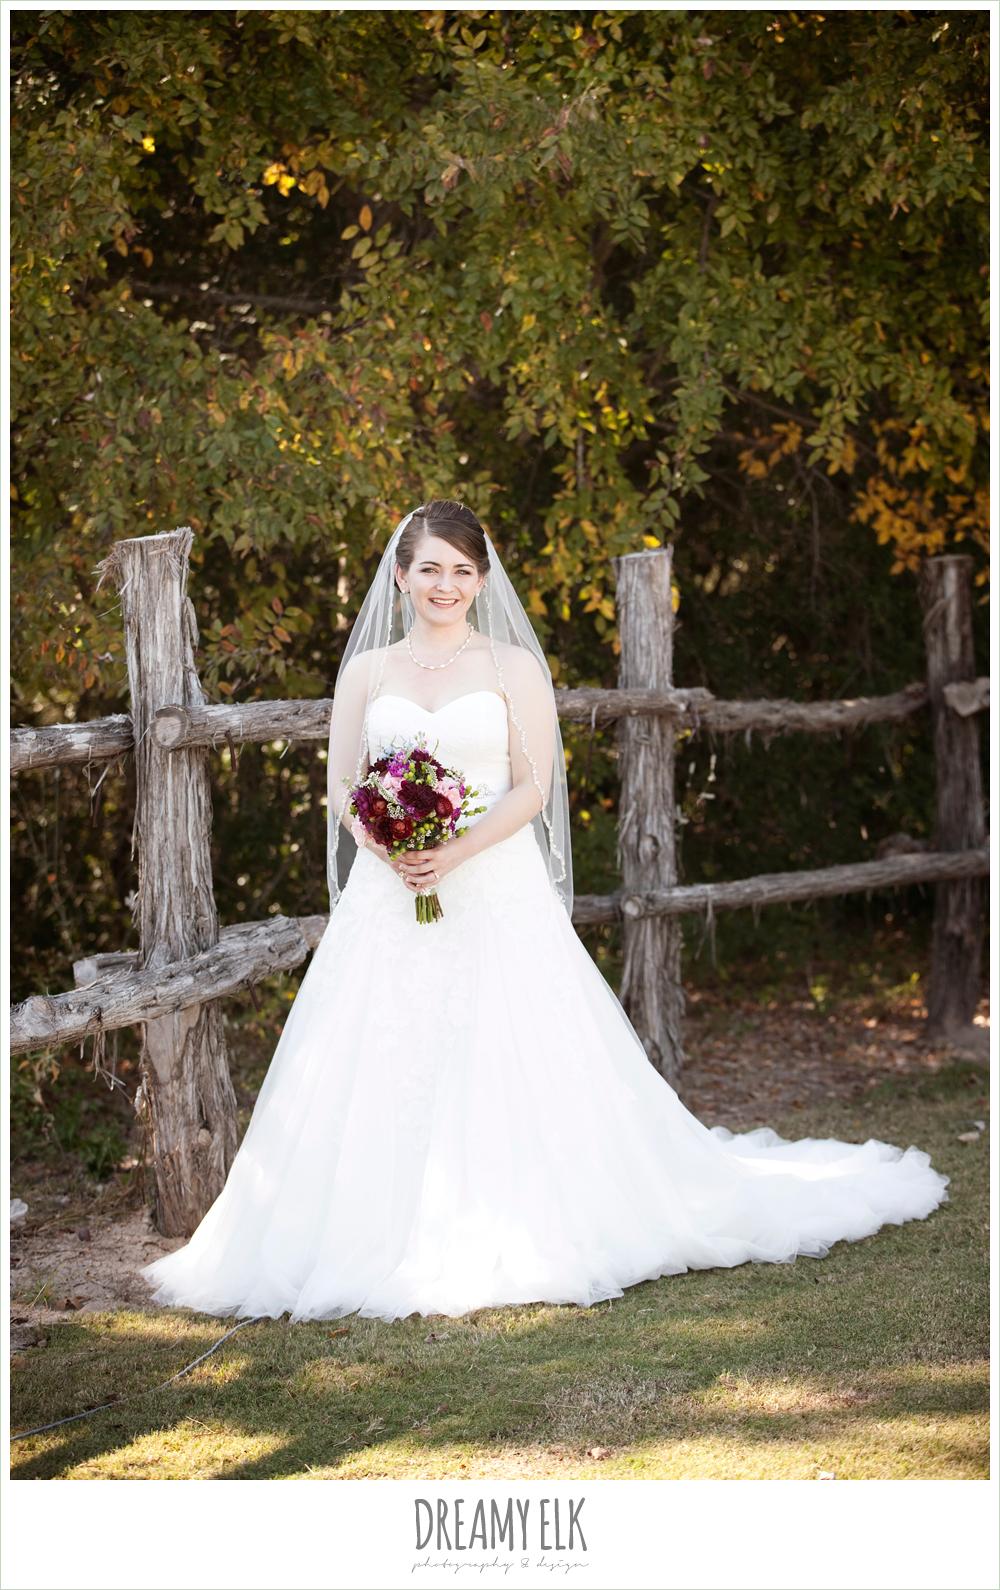 sweetheart strapless wedding dress, pronovias wedding dress, october wedding, inn at quarry ridge, dreamy elk photography and design